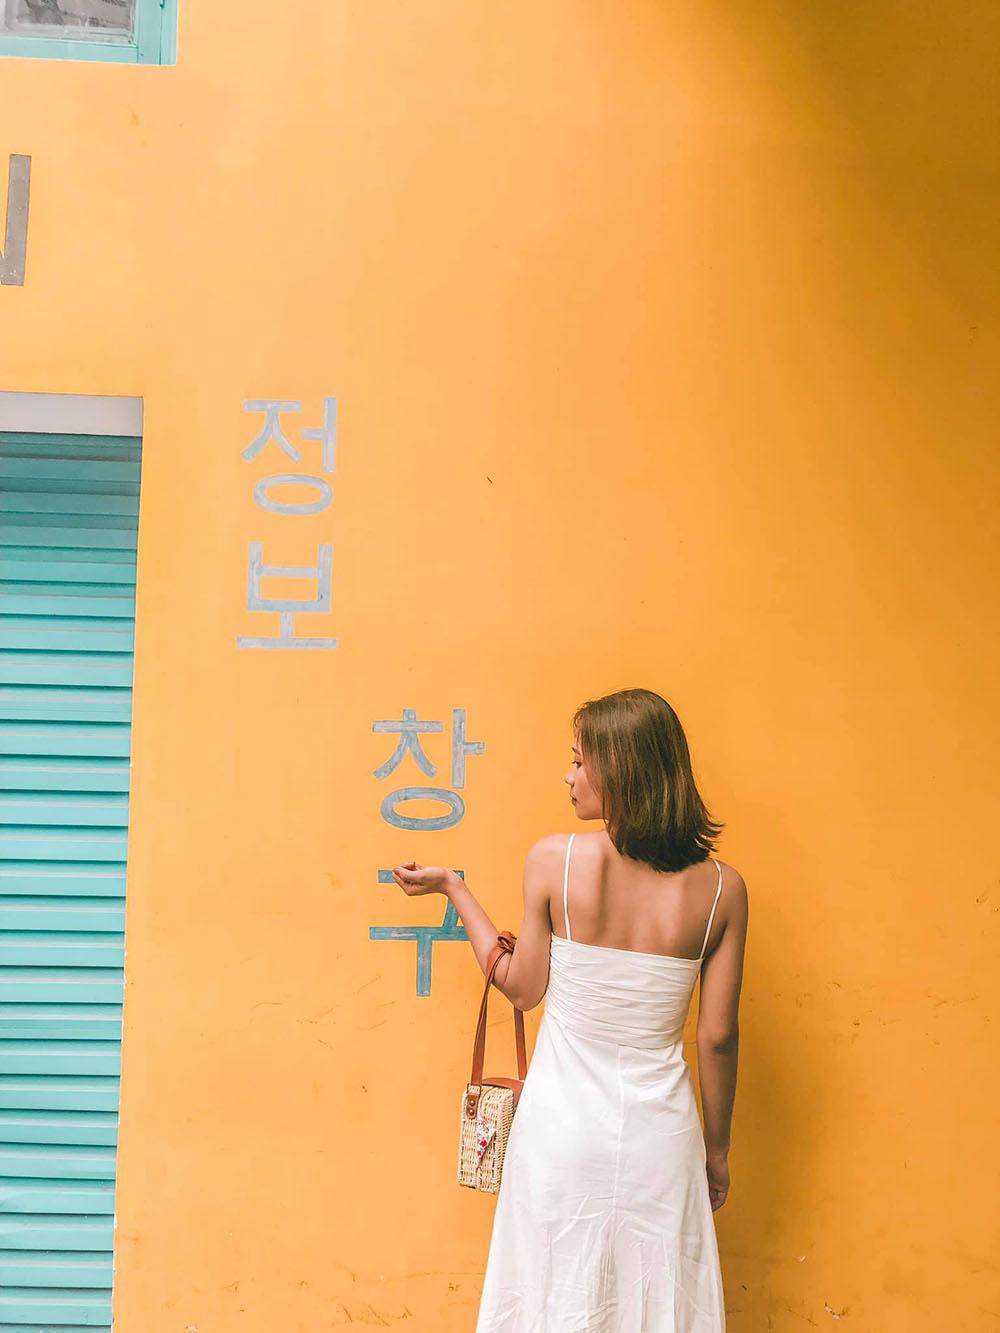 Raon Hotel 97a Hoang Bich Son Review Chuyen Du Lich Hoi An Da Nang Cua 02 Co Ban Than 06